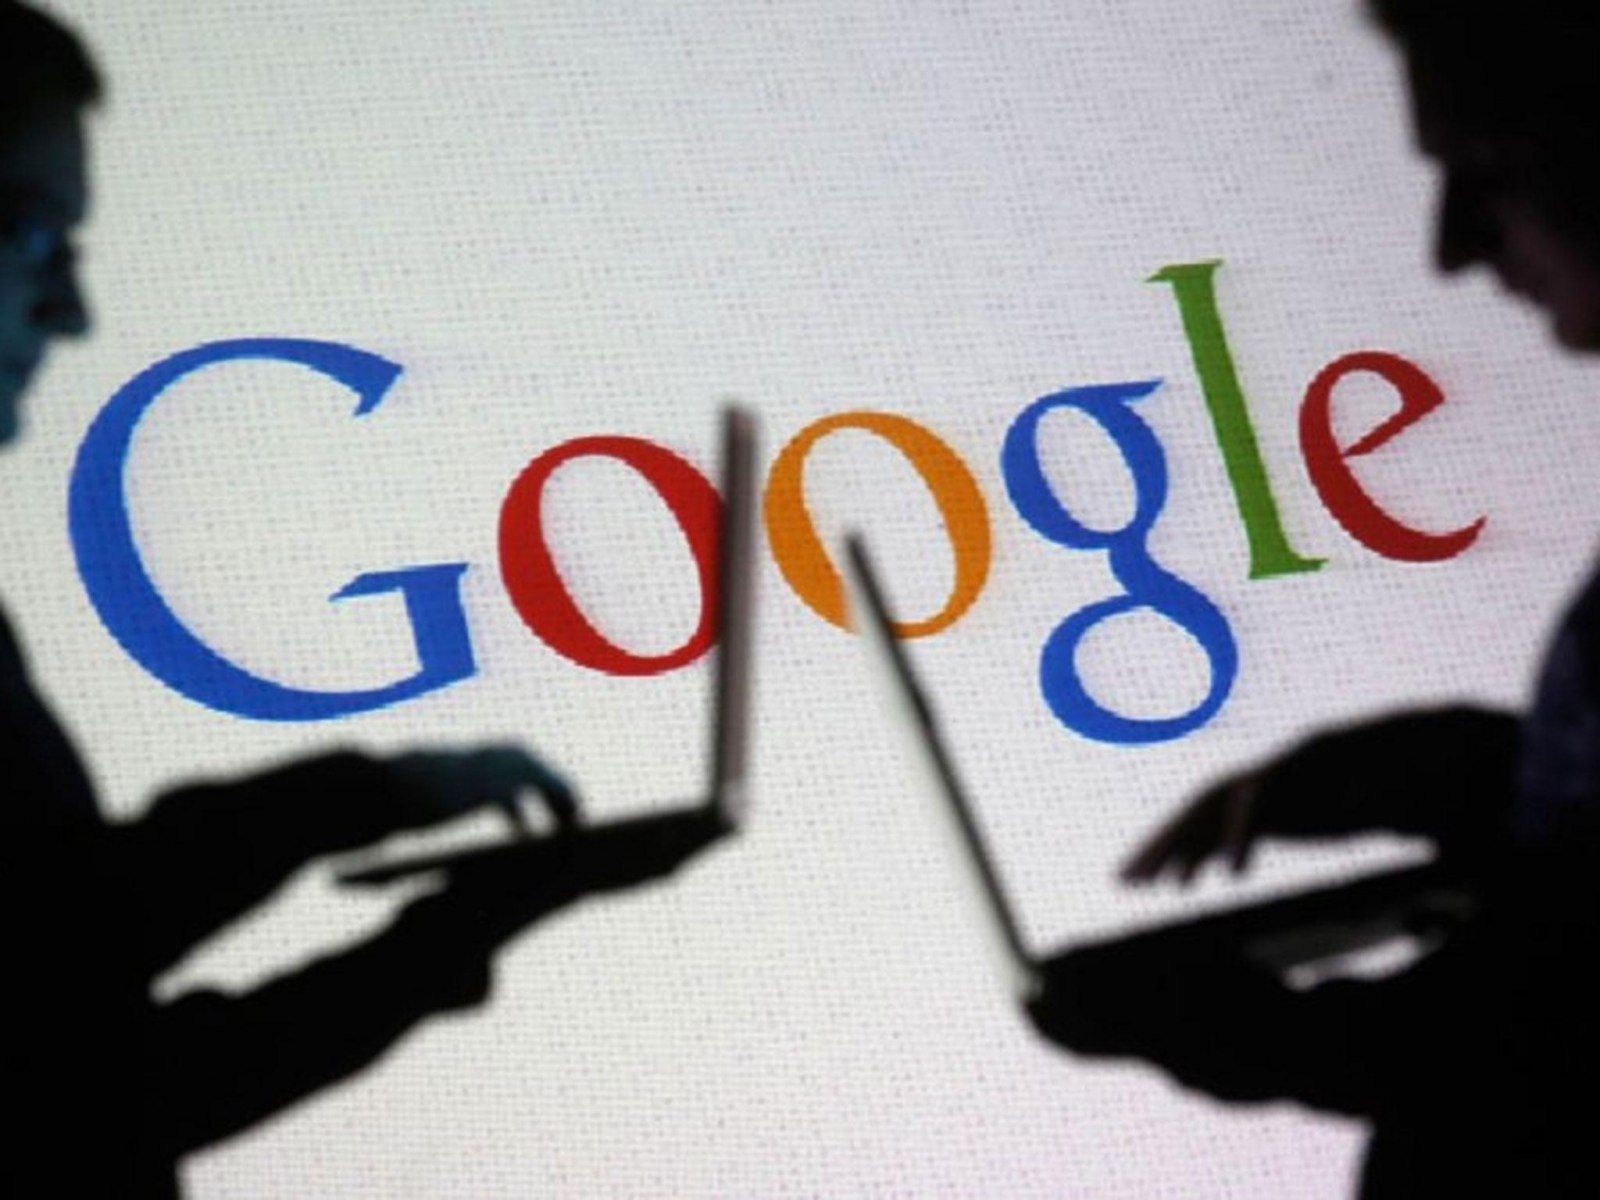 Top Βαθμολογήθηκε ιστοσελίδες dating Ινδία